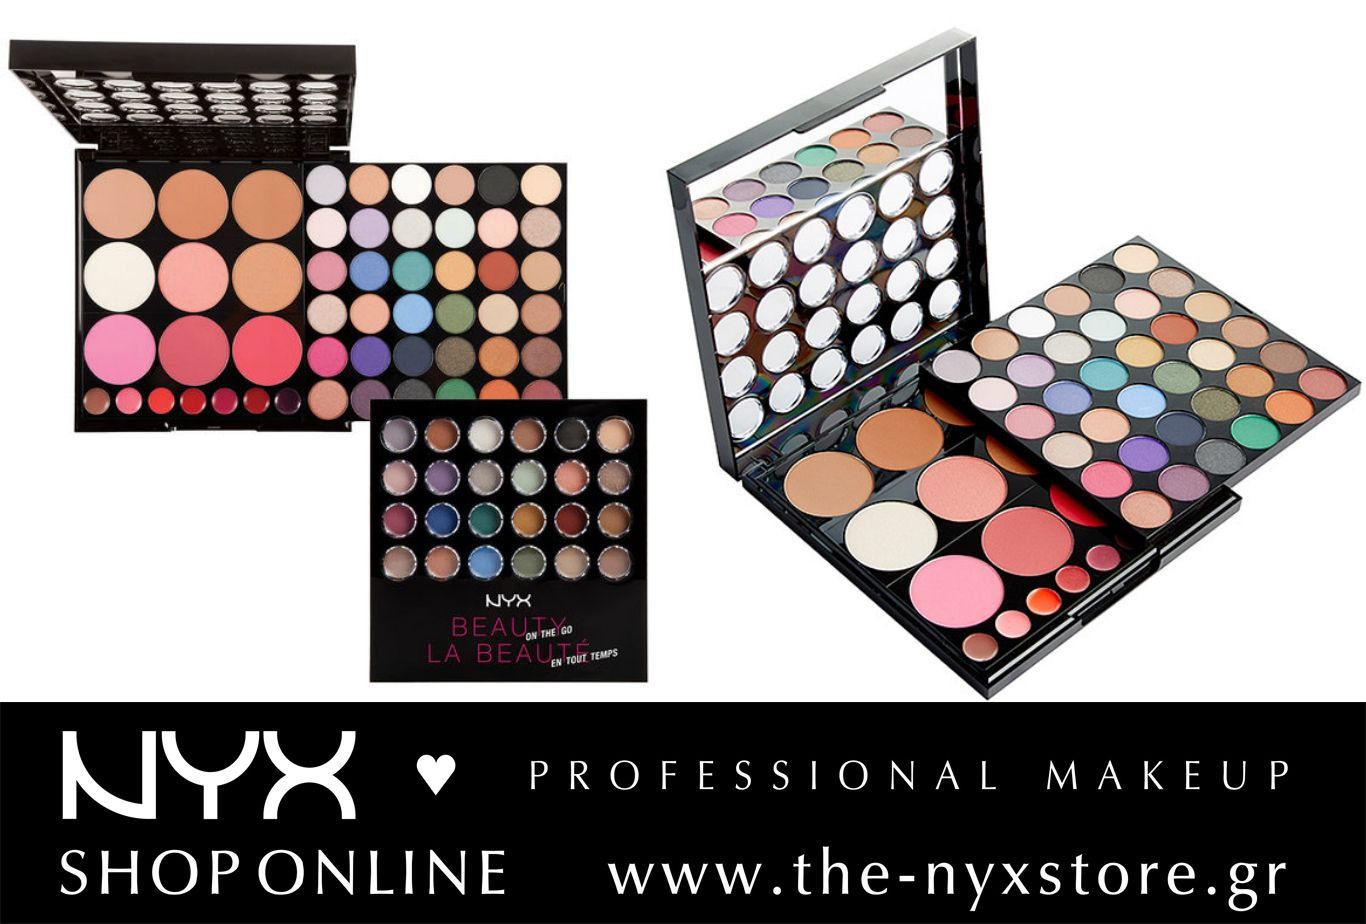 "H παλέτα που τα έχει όλα! Η NYX ""Beauty on the Go"" Palette περιέχει 36 σκιές ματιών με ματ, satin και shimmer υφή για αμέτρητους συνδυασμούς, 3 ματ bronzers, 3 highlighters, 3 ρουζ και 7 κραγιόν για να ολοκληρώσετε το look! Must-have για τις γυναίκες που ταξιδεύουν πολύ και είναι συνέχεια on the go!  Βρείτε την παλέτα στο e-shop μας: http://bit.ly/1QYkBvo"